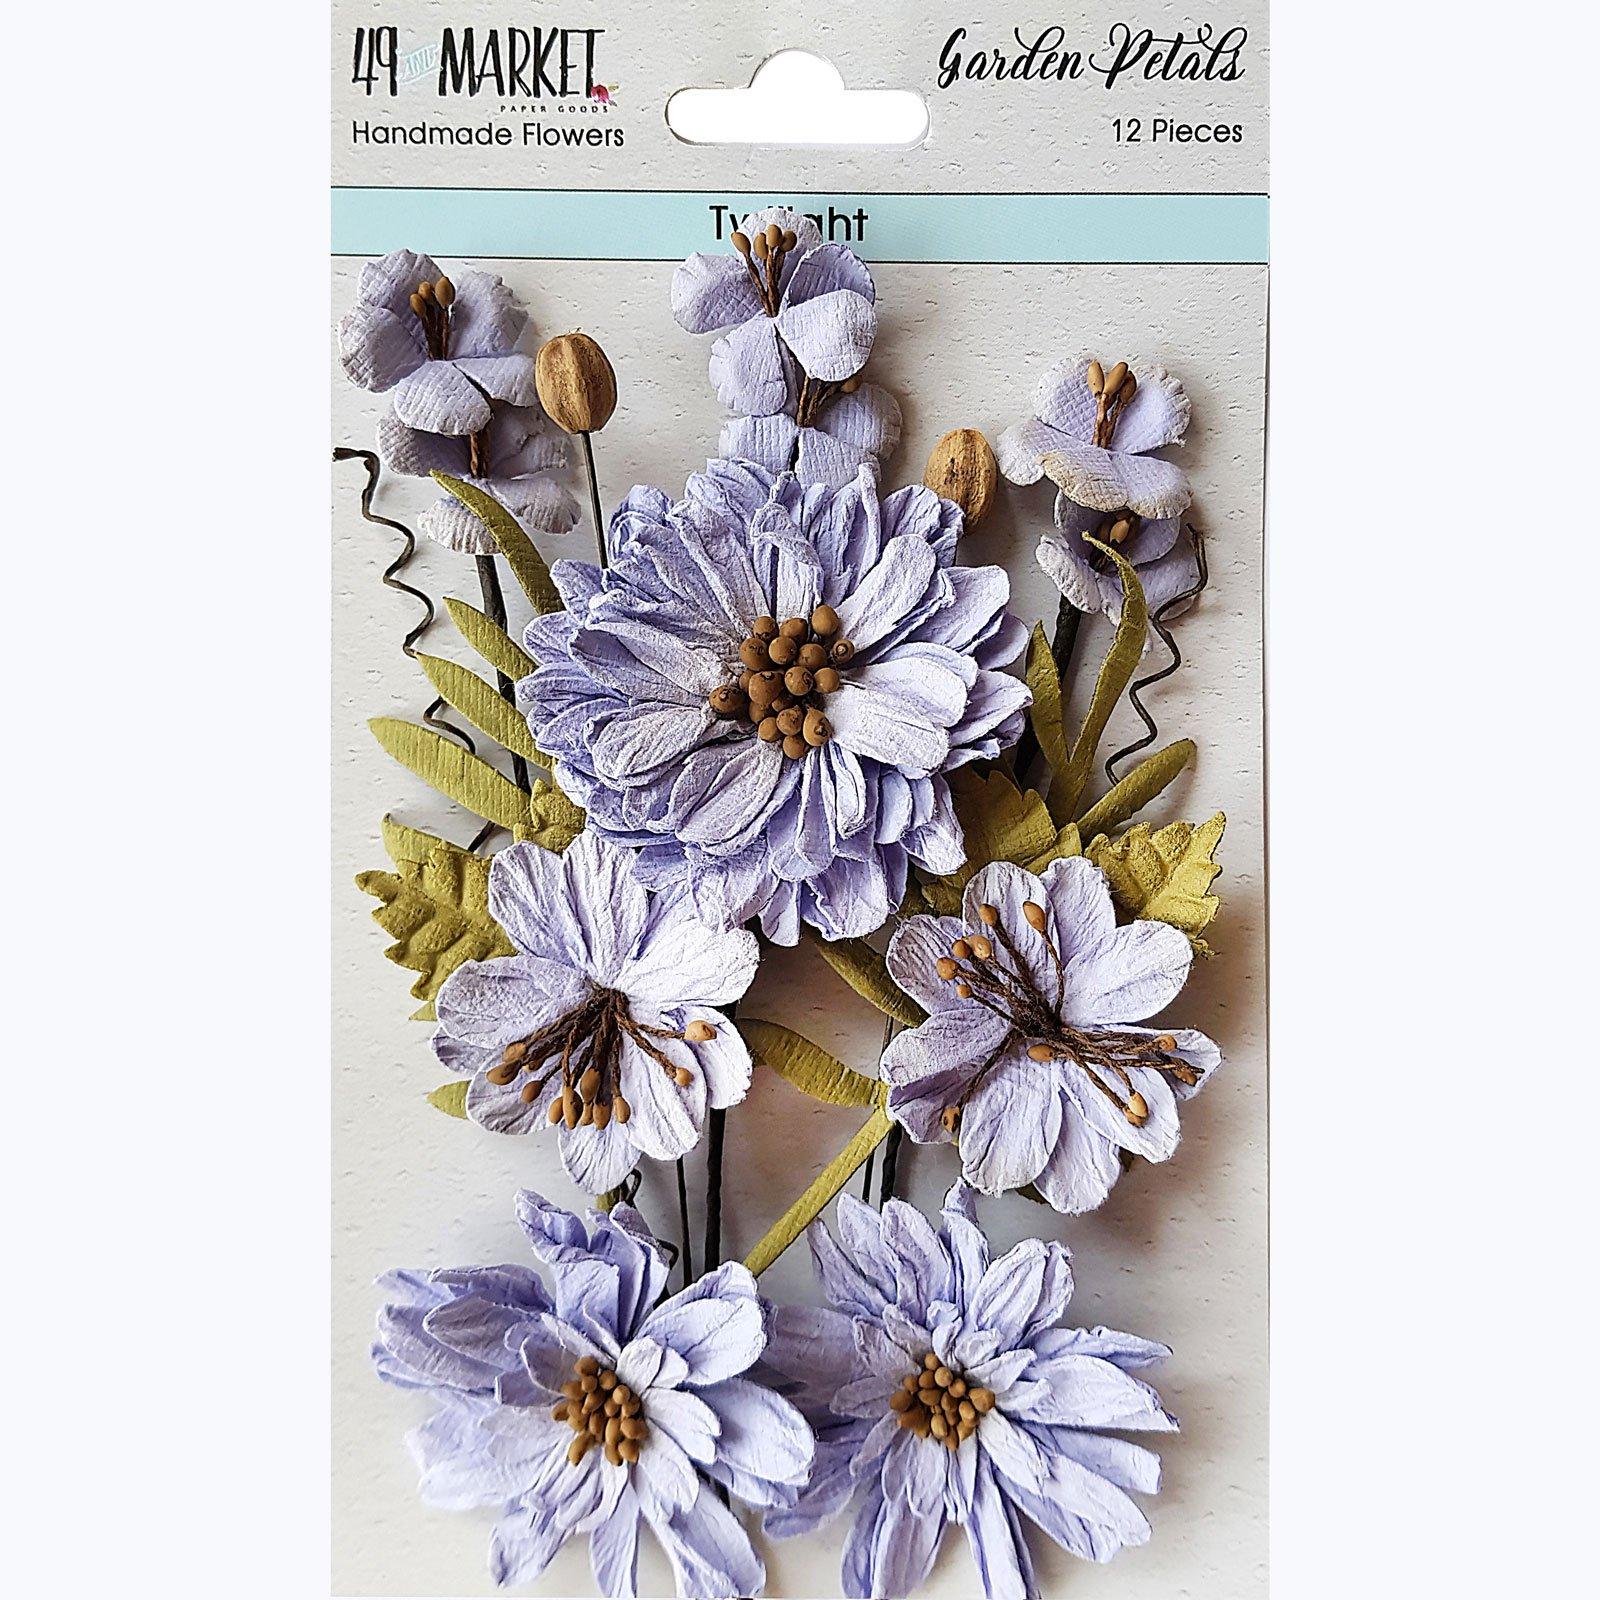 49 & Market - Garden Petals: Twilight